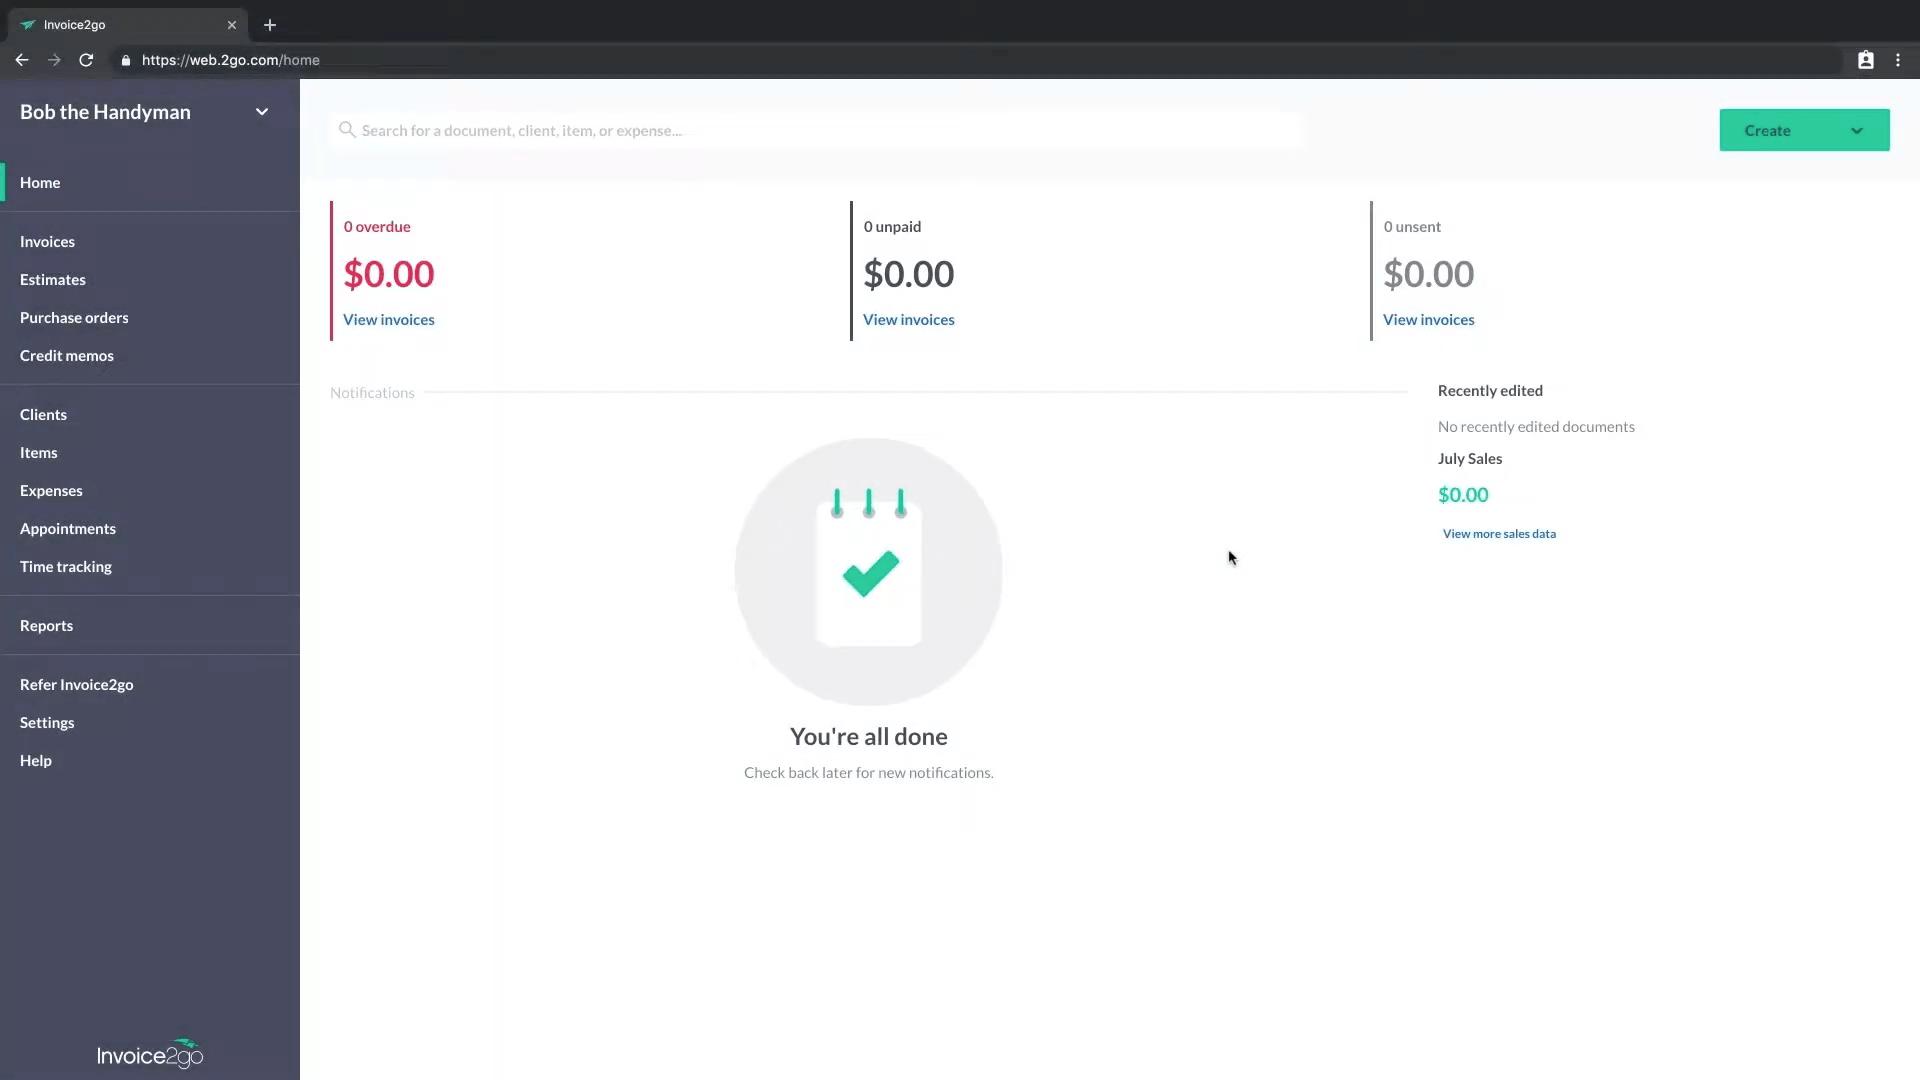 Invoice2Go Interface